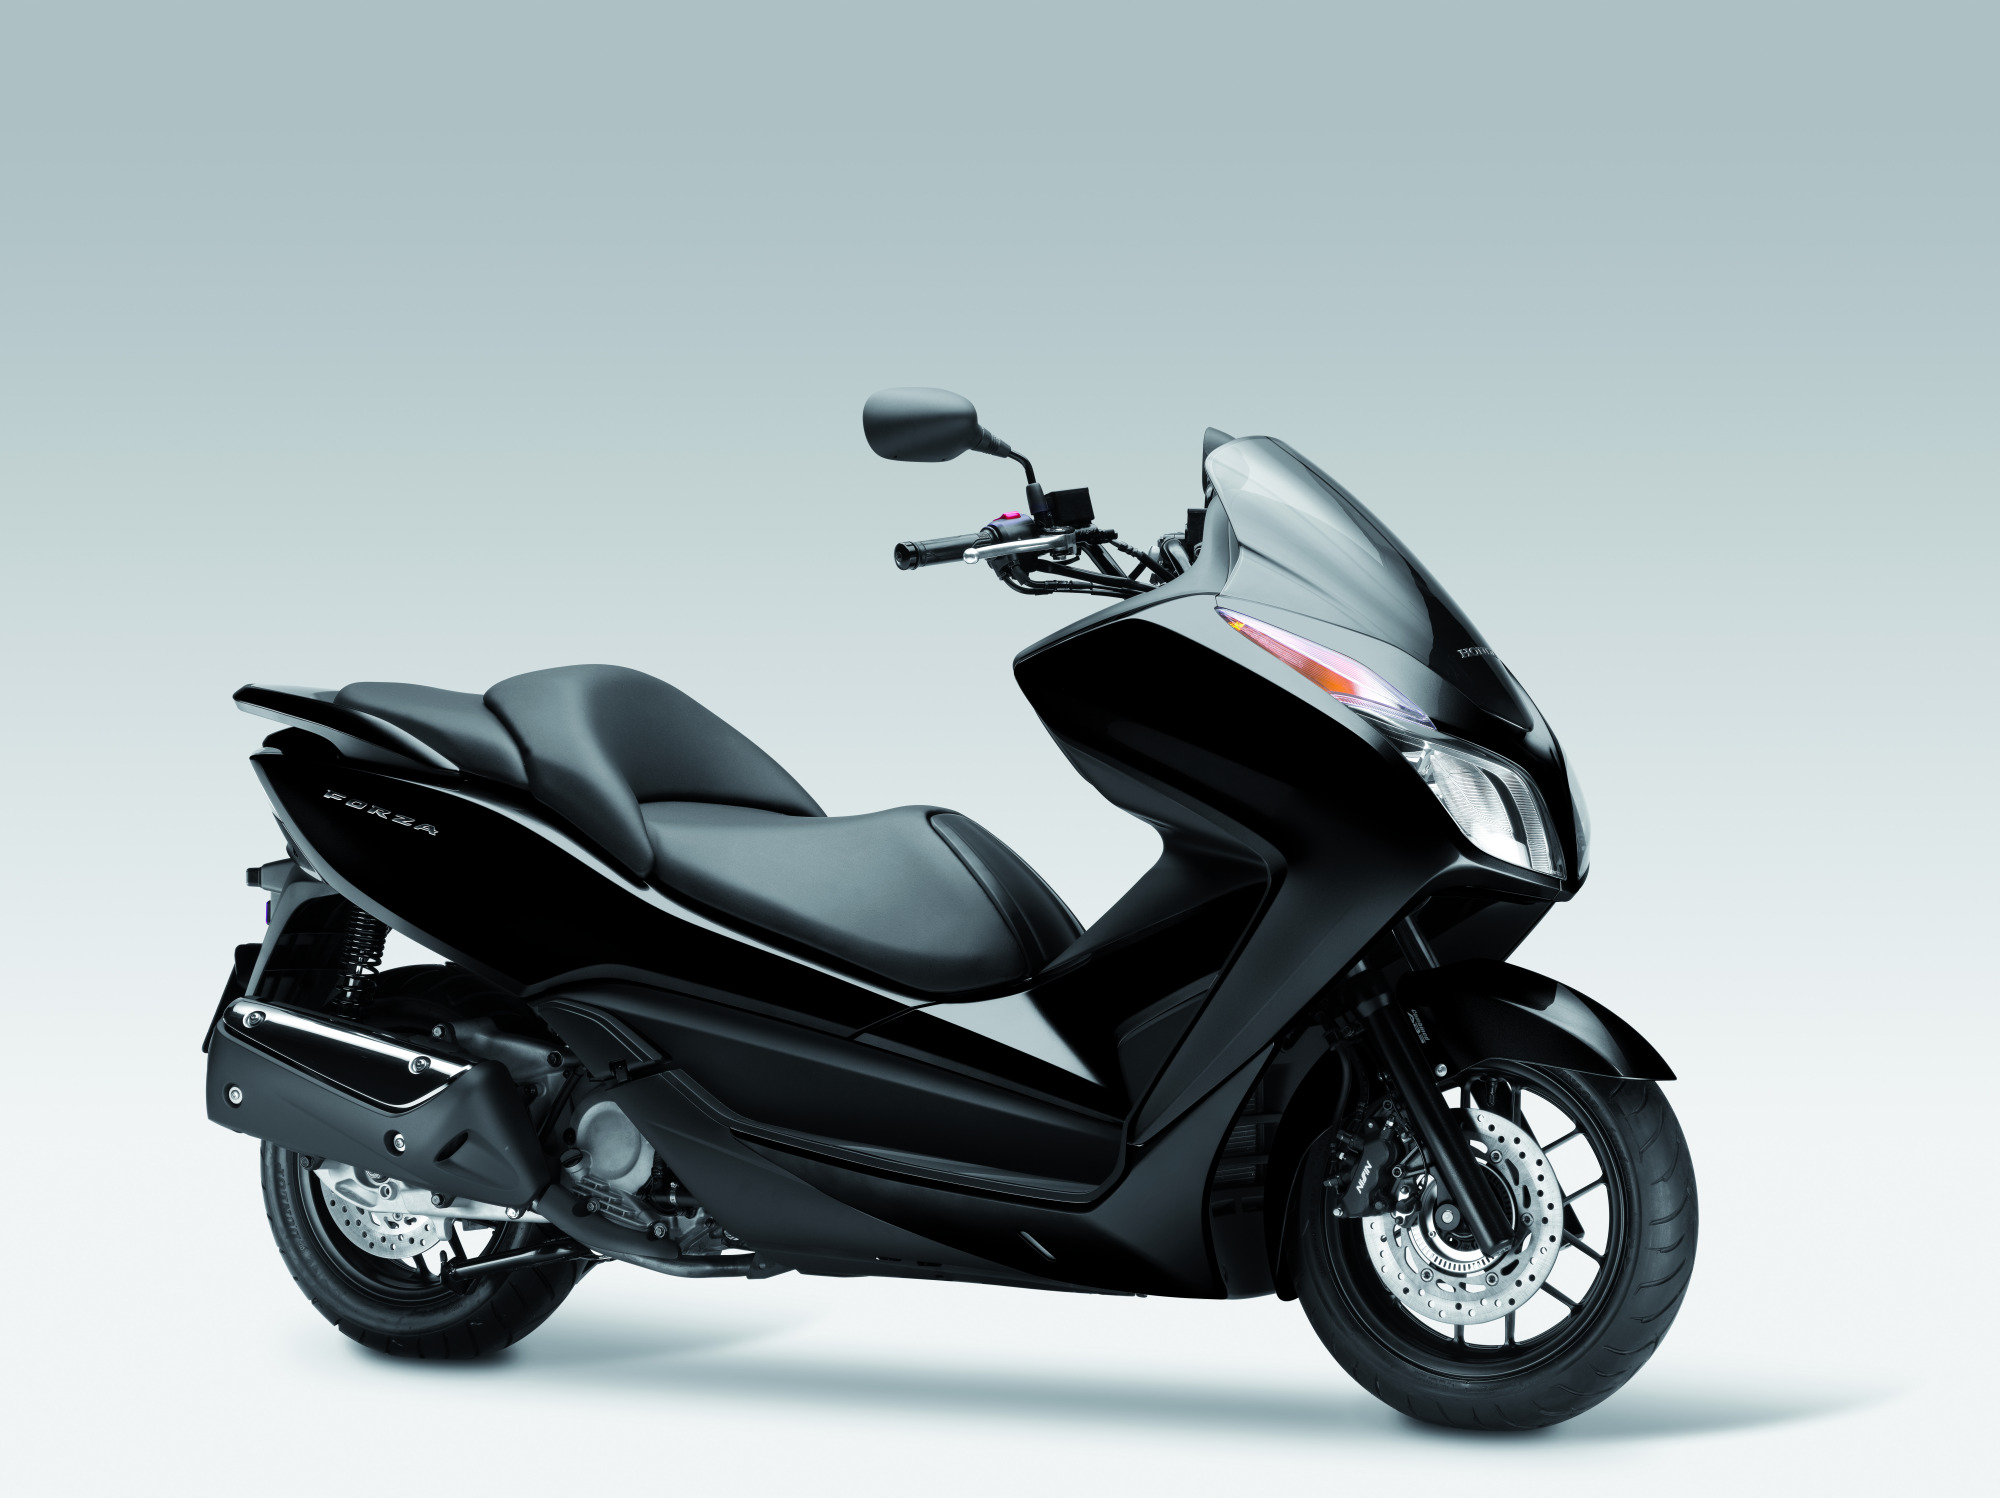 honda nss 300 forza technische daten aktuelle motorrad. Black Bedroom Furniture Sets. Home Design Ideas